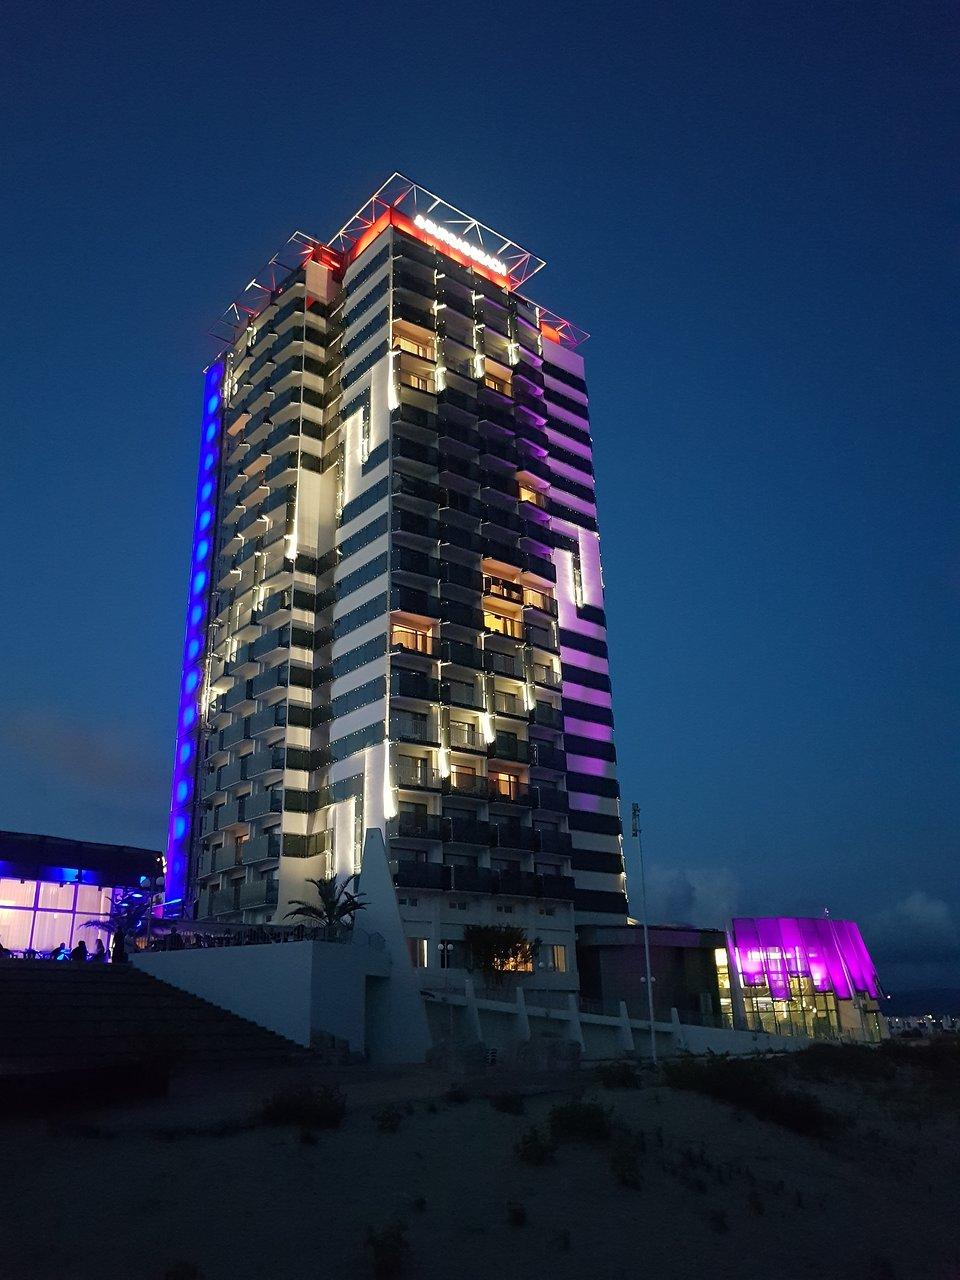 BURGAS BEACH HOTEL - UPDATED 2018 Reviews & Price Comparison (Sunny Beach, Bulgaria) - TripAdvisor